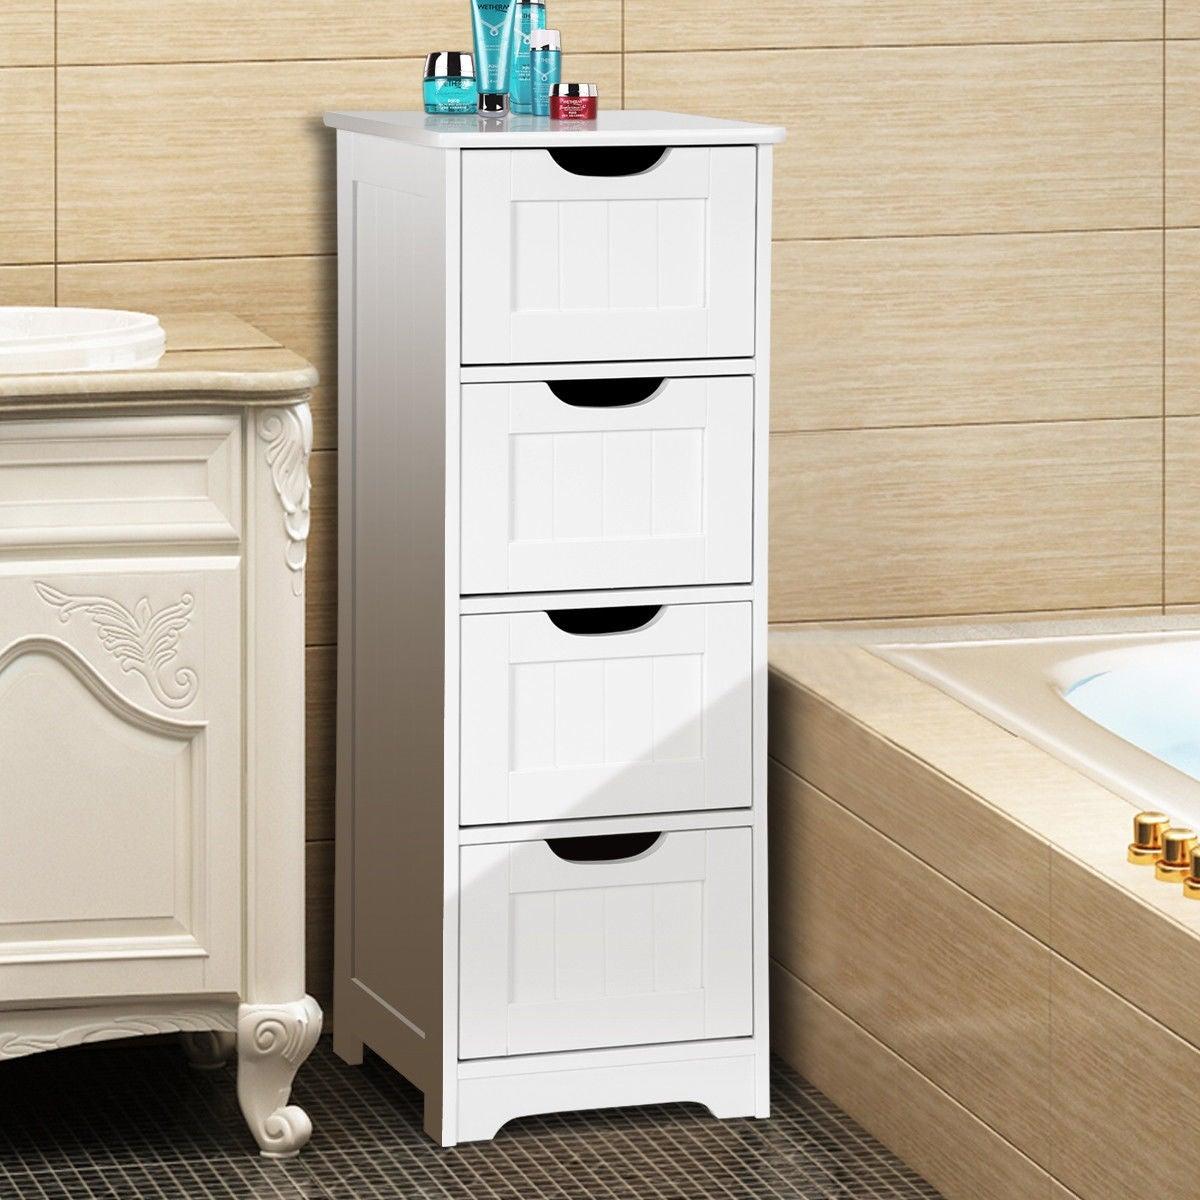 Gymax Bathroom Floor Cabinet Wooden Free Standing Storage Side Organizer W4 Drawers regarding measurements 1200 X 1200